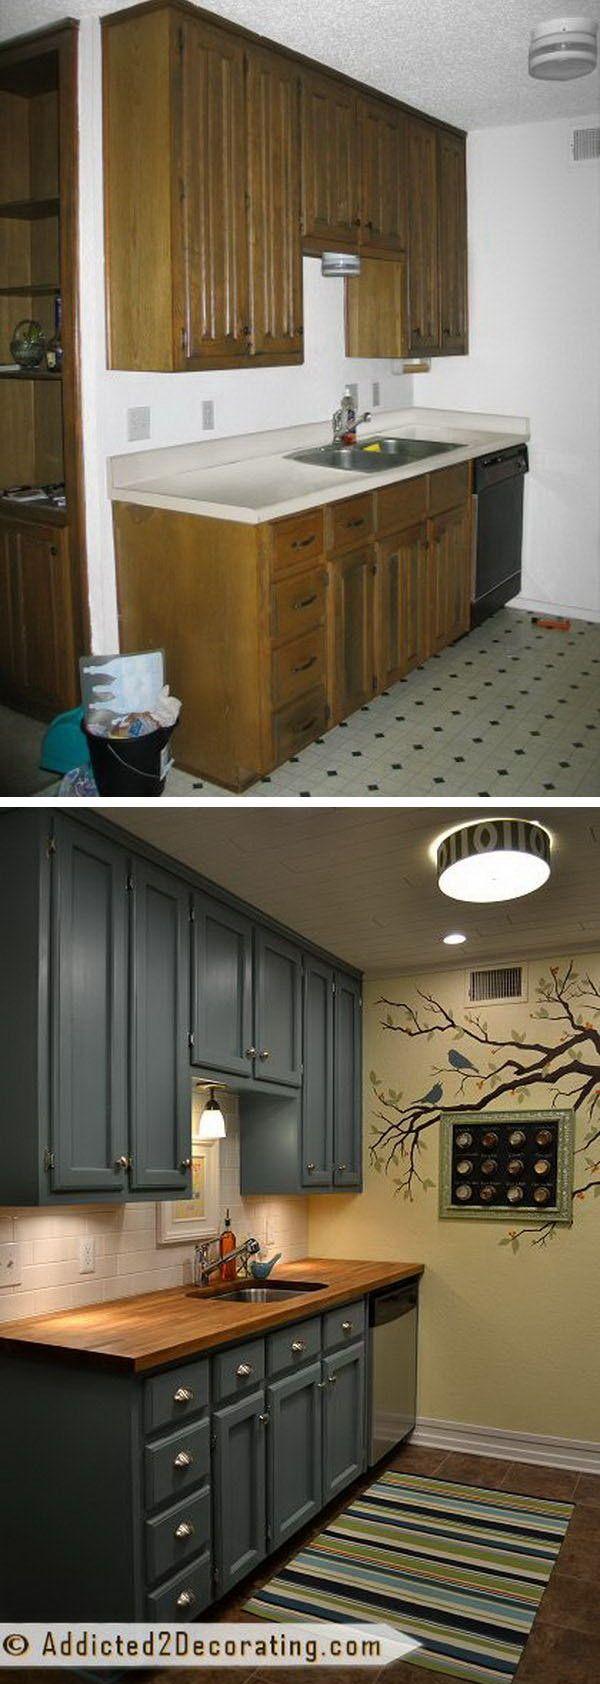 Best 25 House Remodeling Ideas On Pinterest Diy Kitchen Remodel